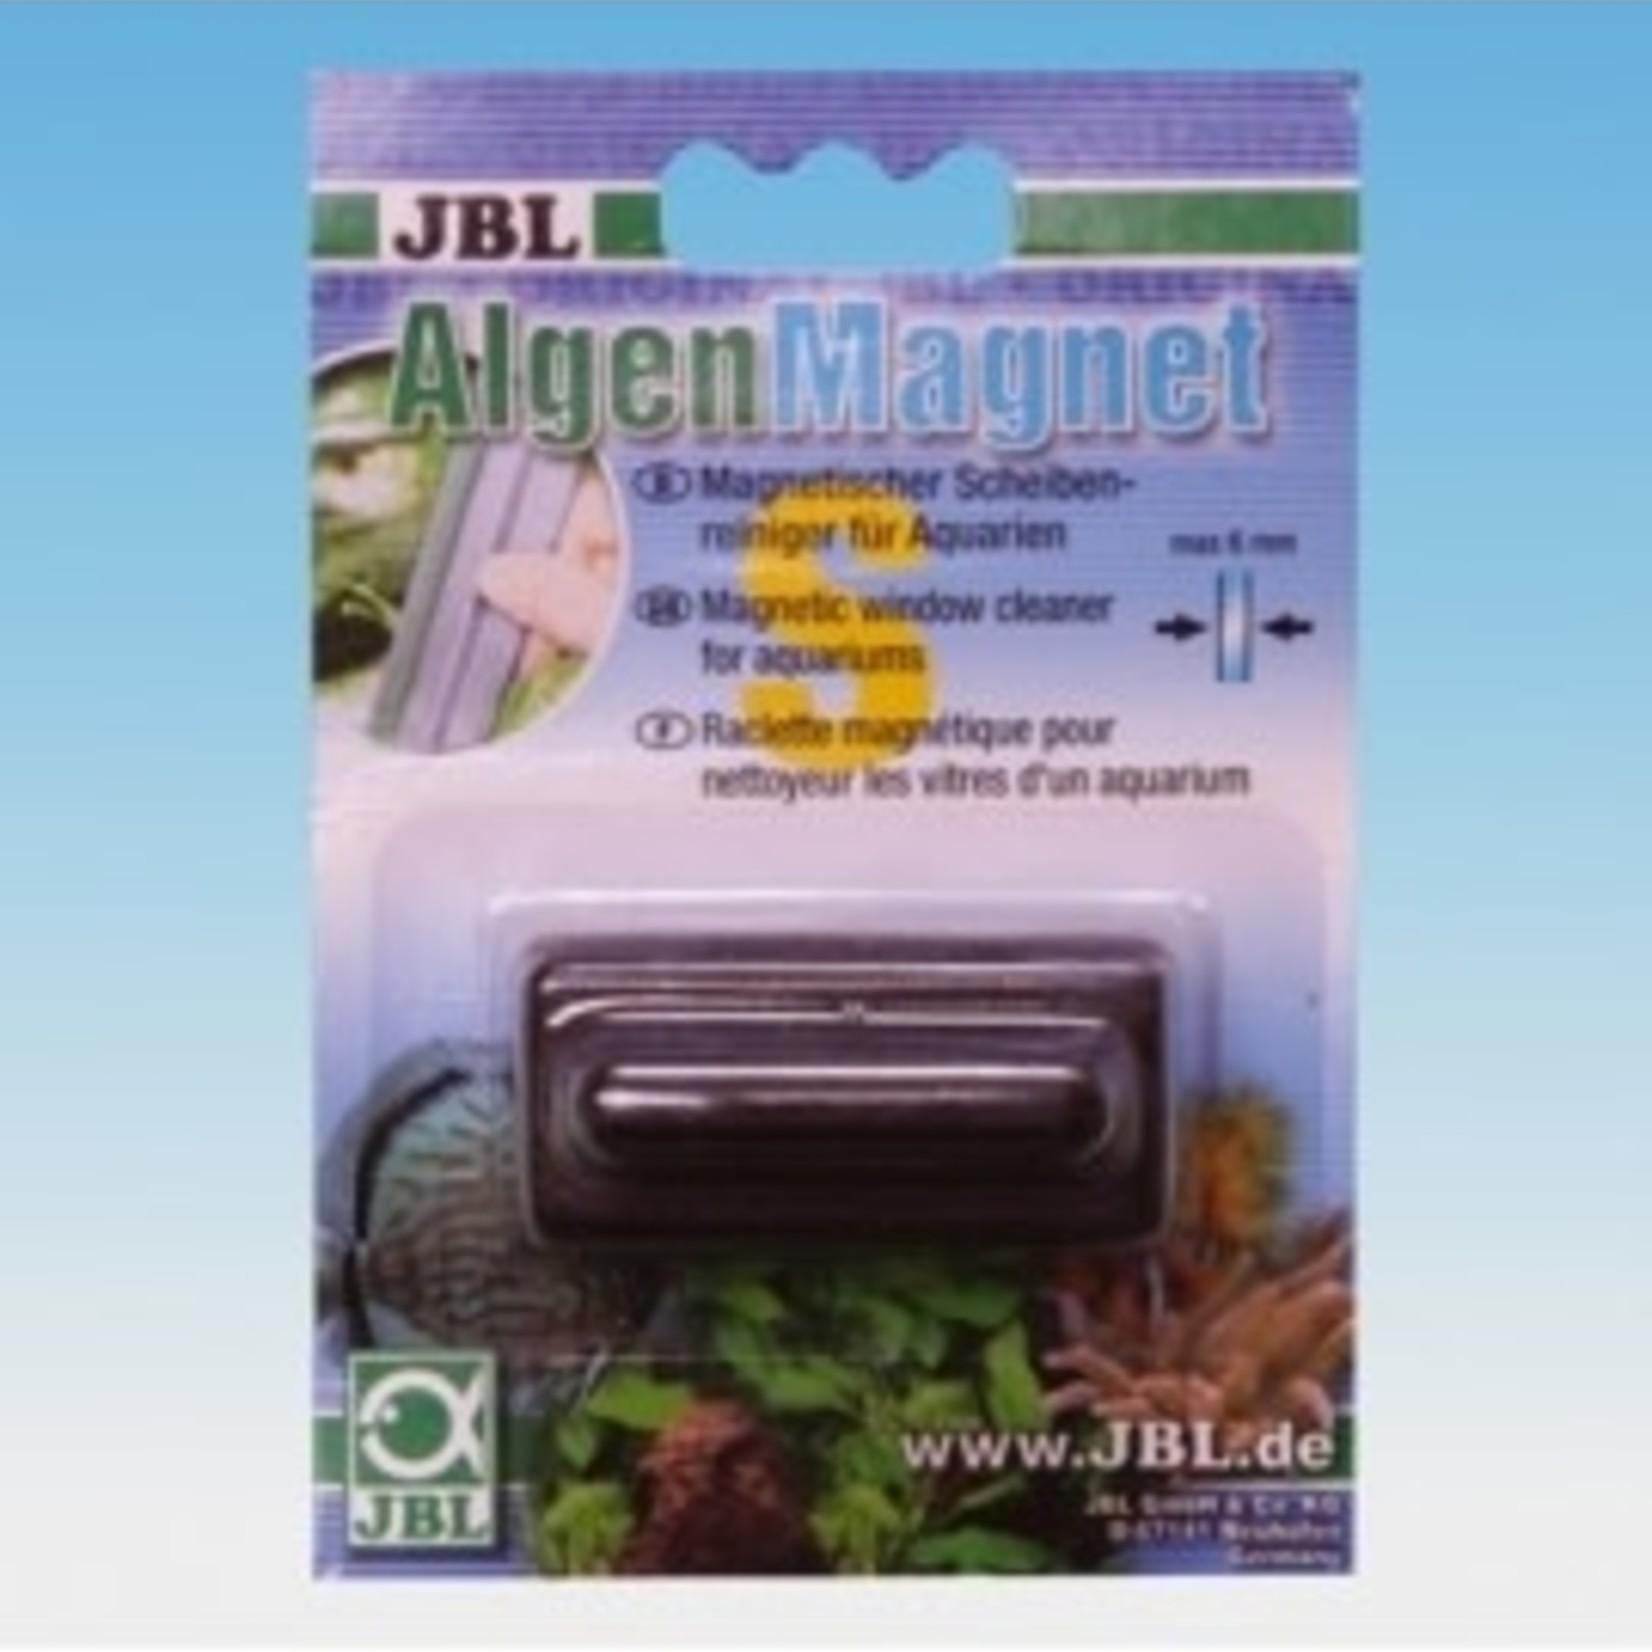 JBL Algen magneet